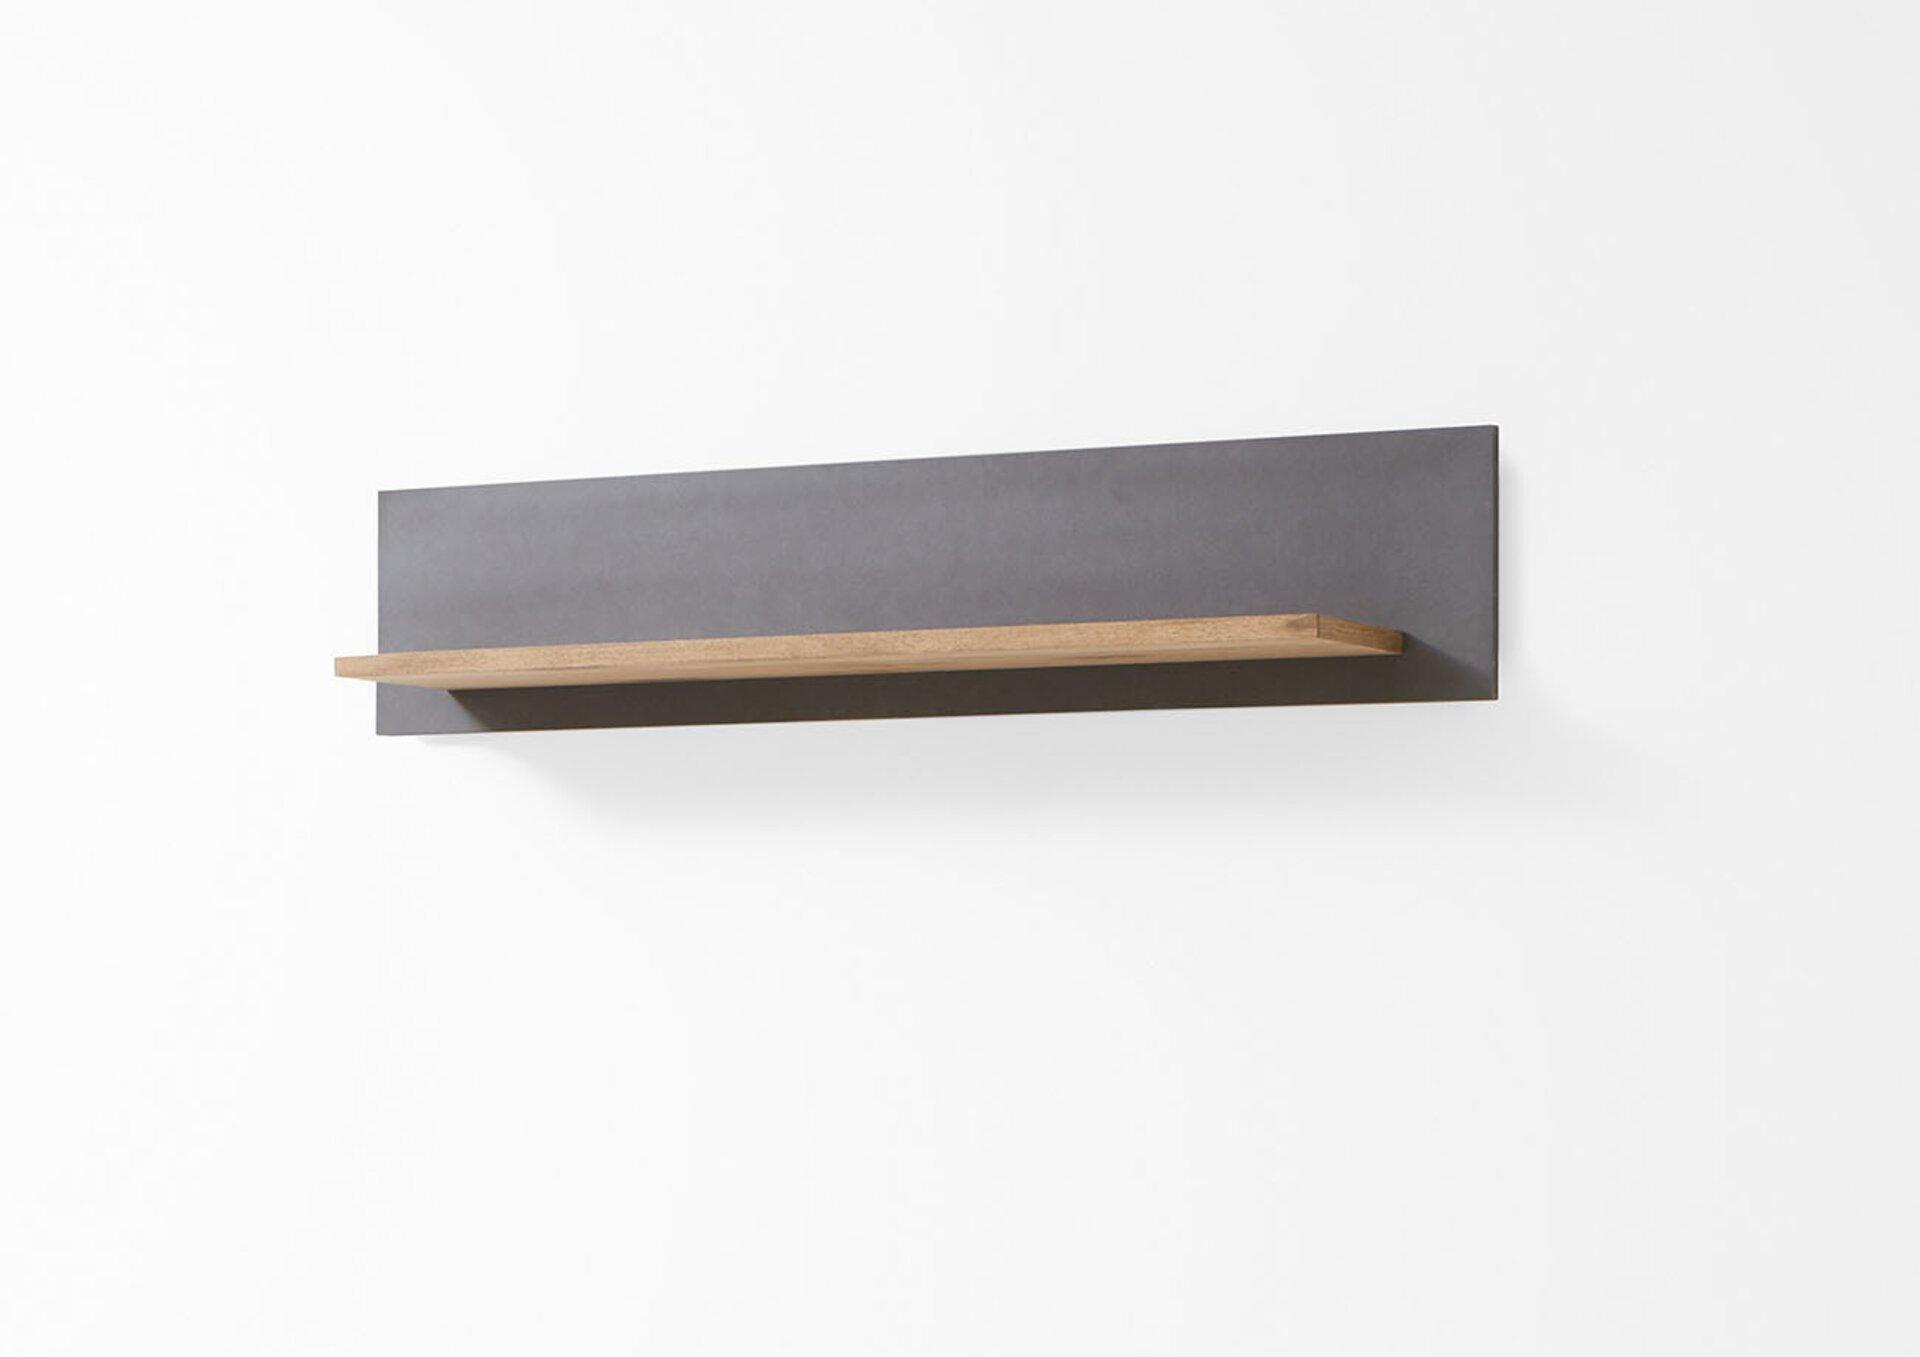 Wandbord CHARON MONDO Holzwerkstoff mehrfarbig 25 x 29 x 140 cm